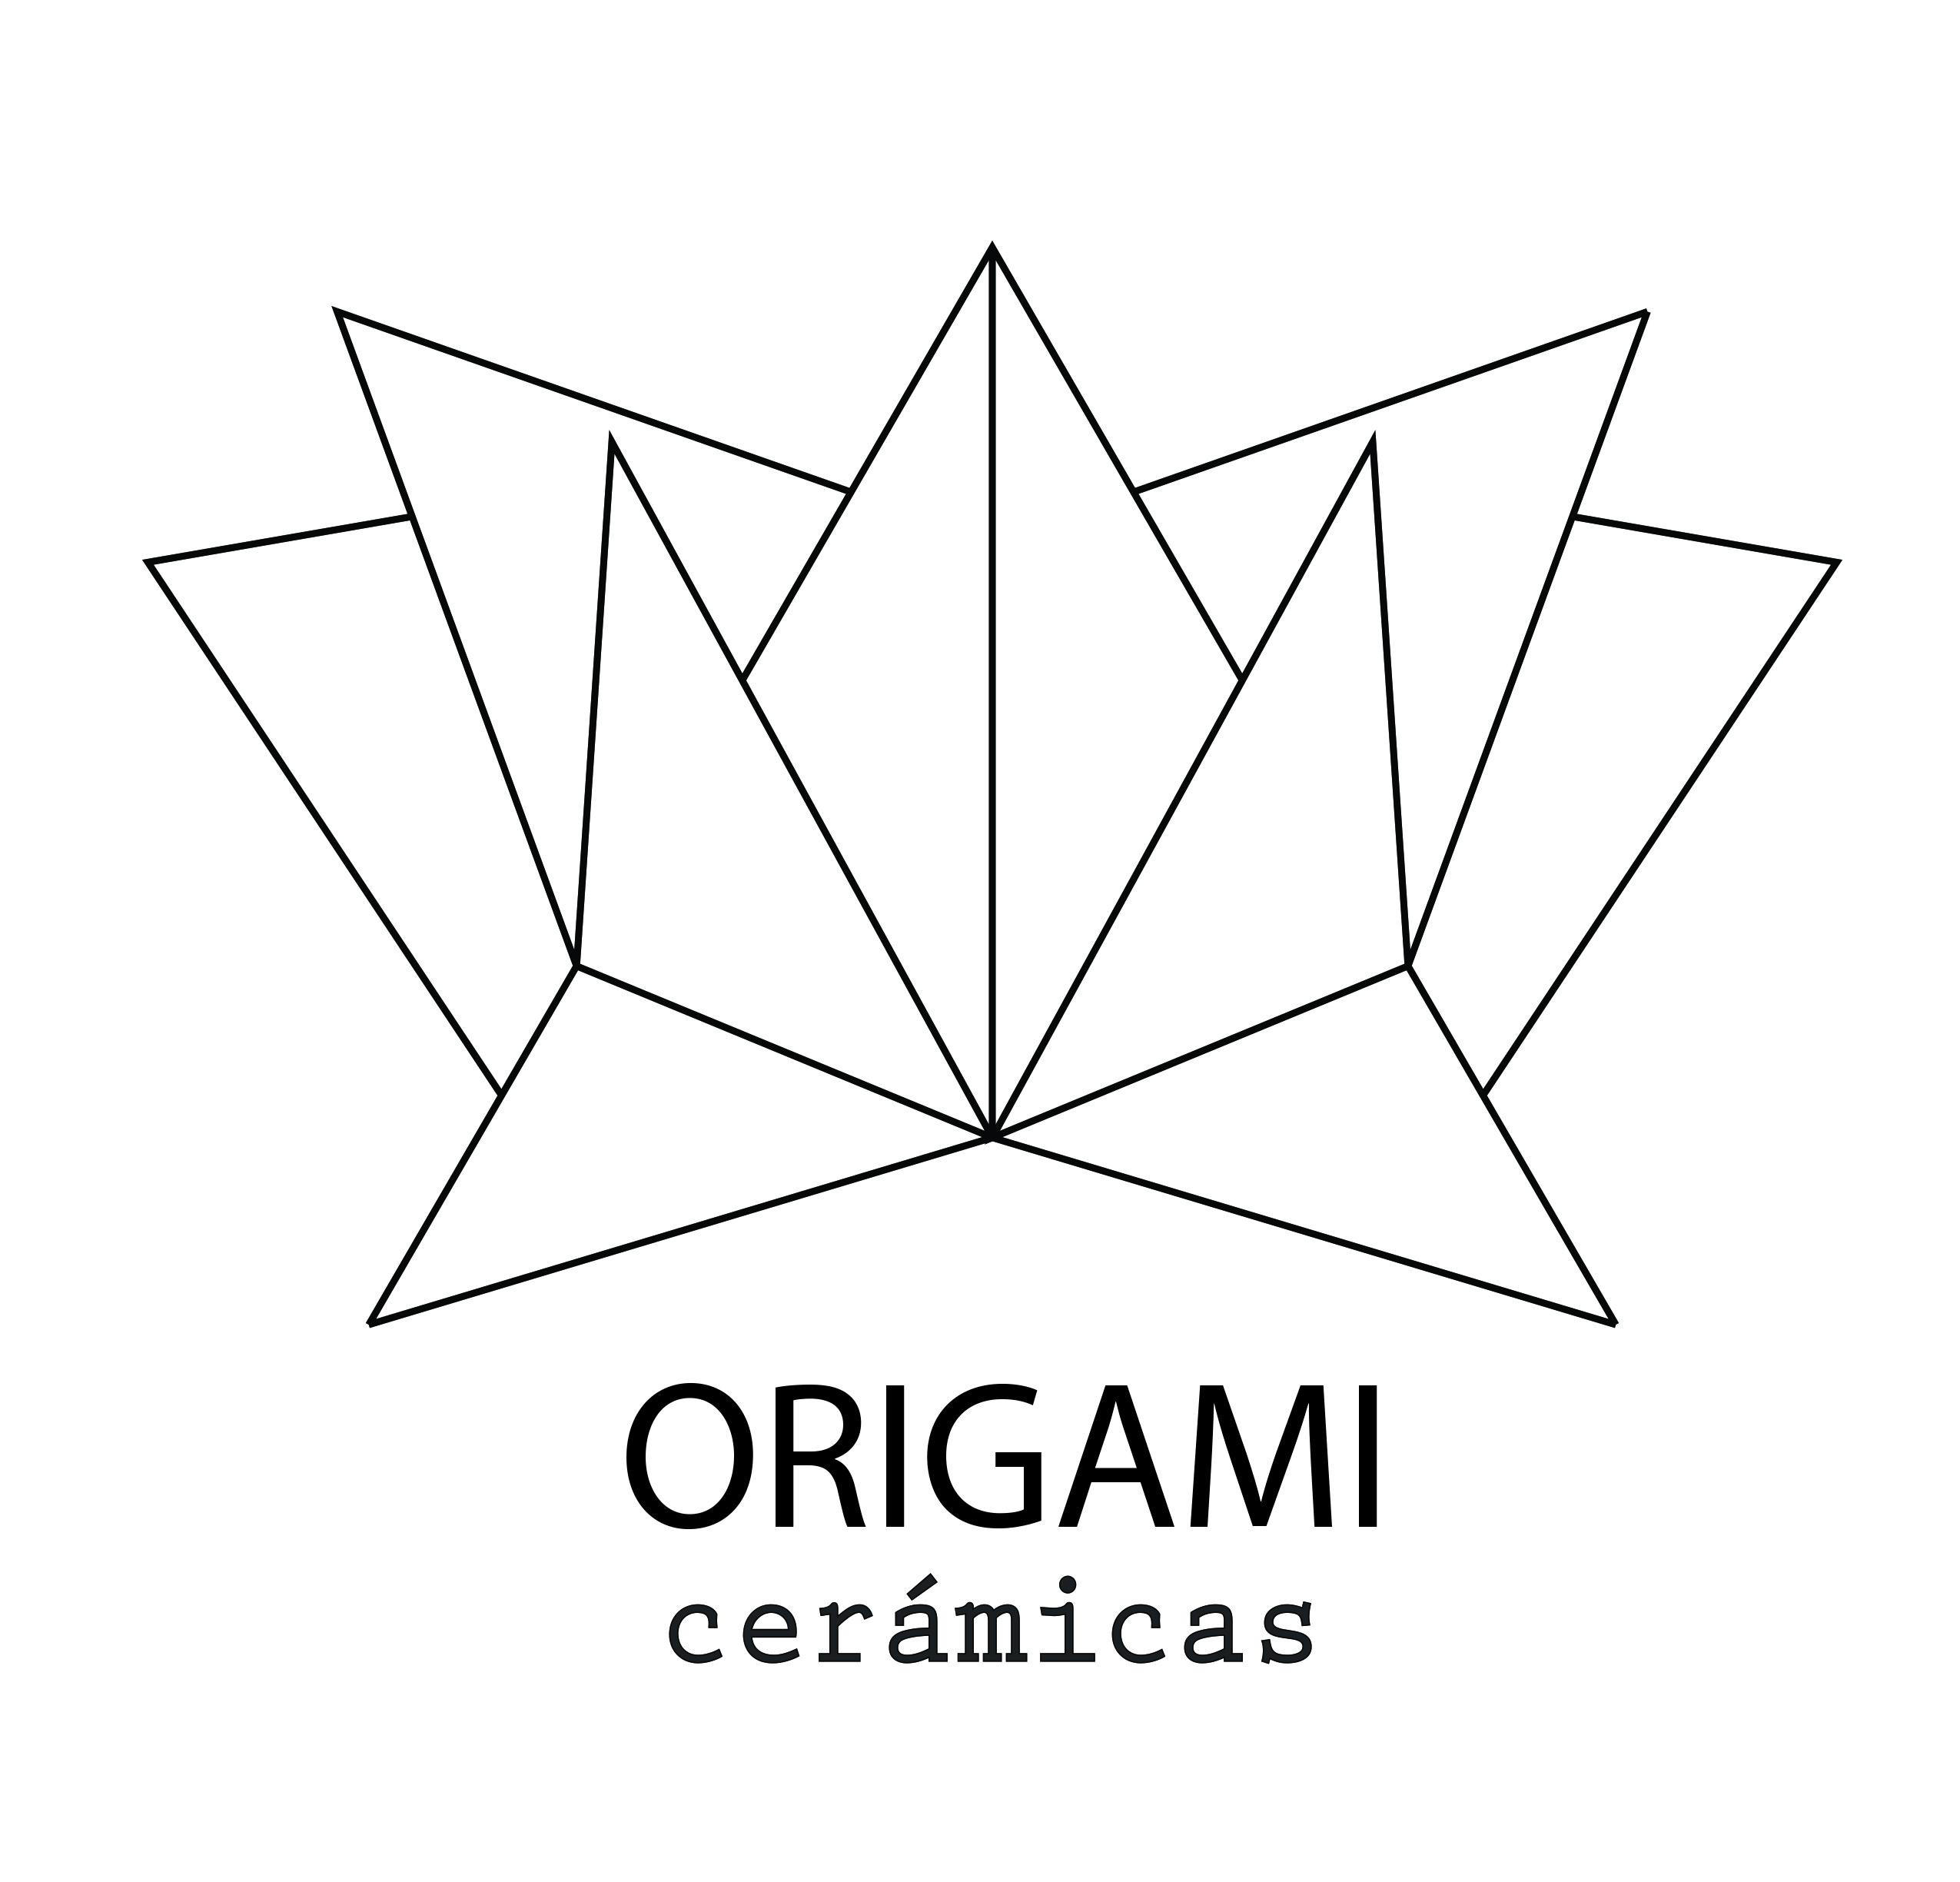 Origami Cerámicas